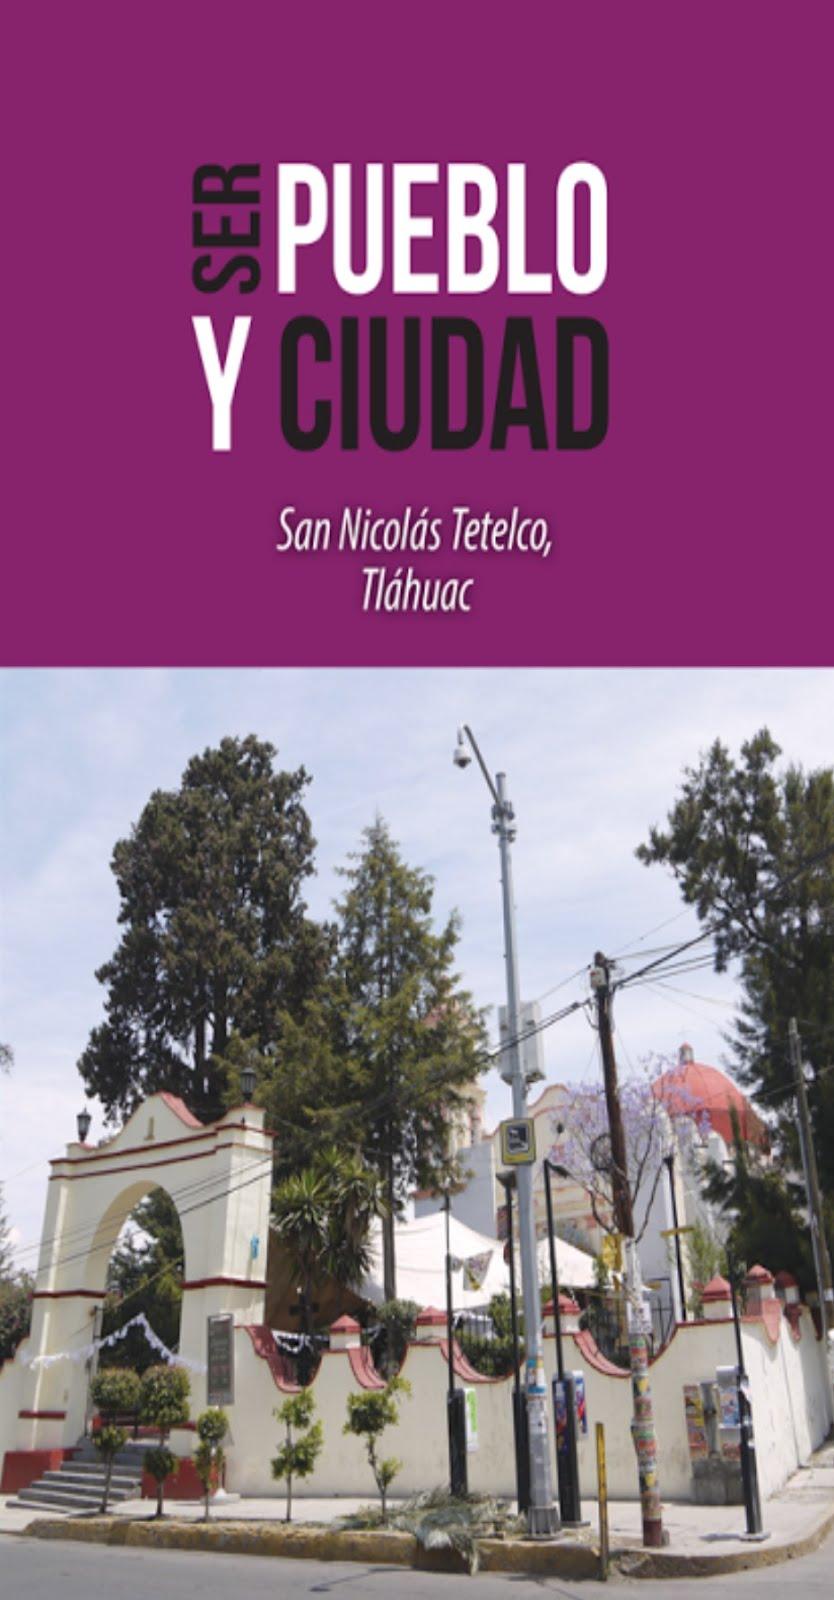 San Nicolás Tetelco